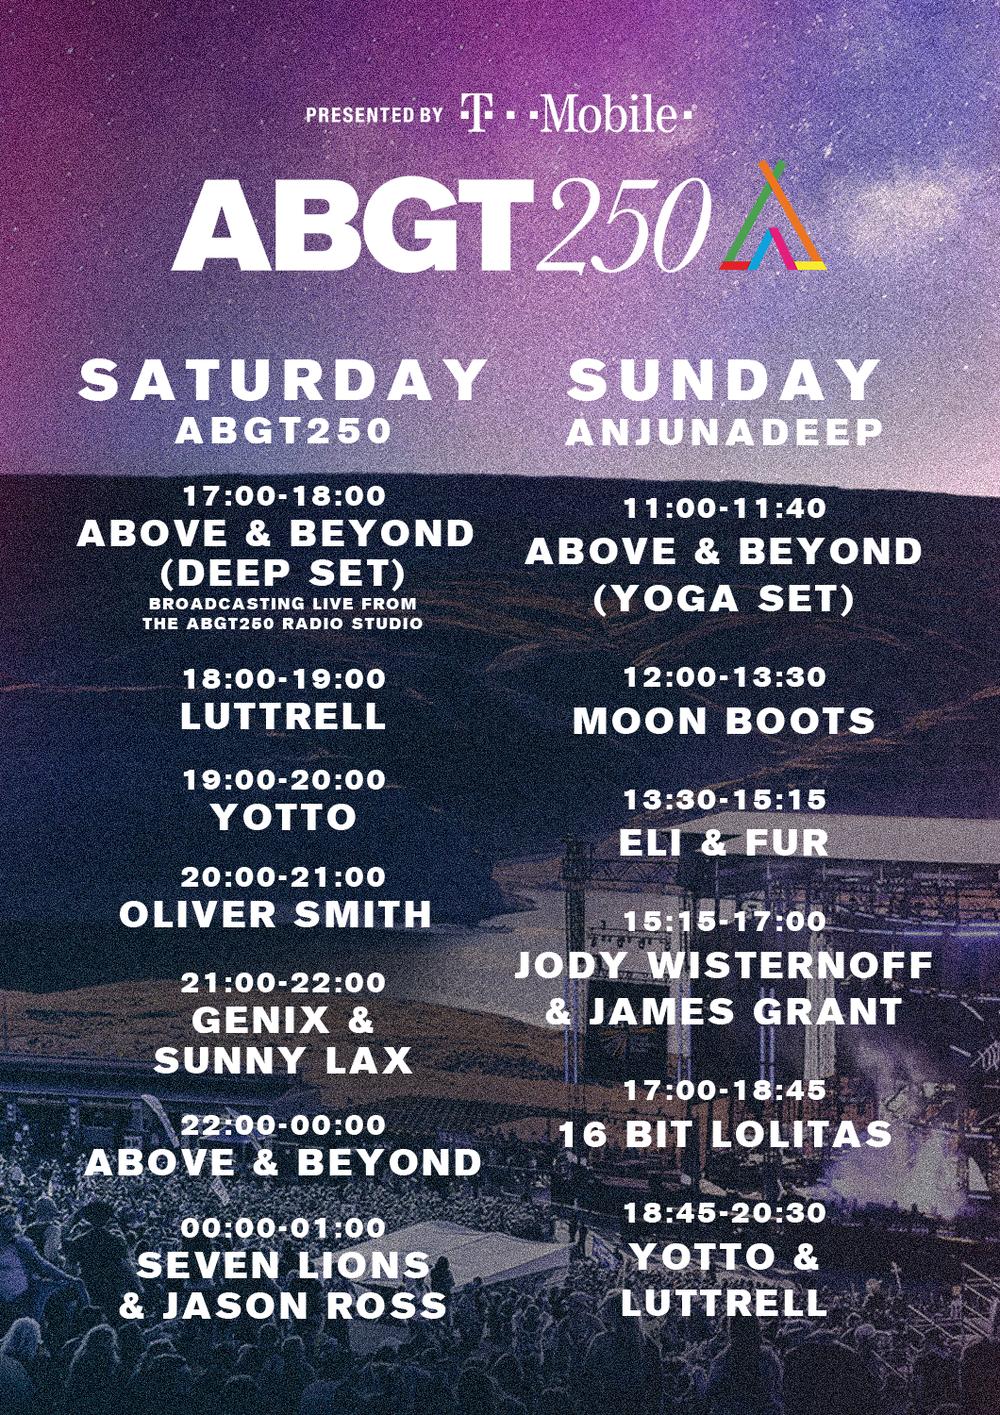 above & beyond abgt250